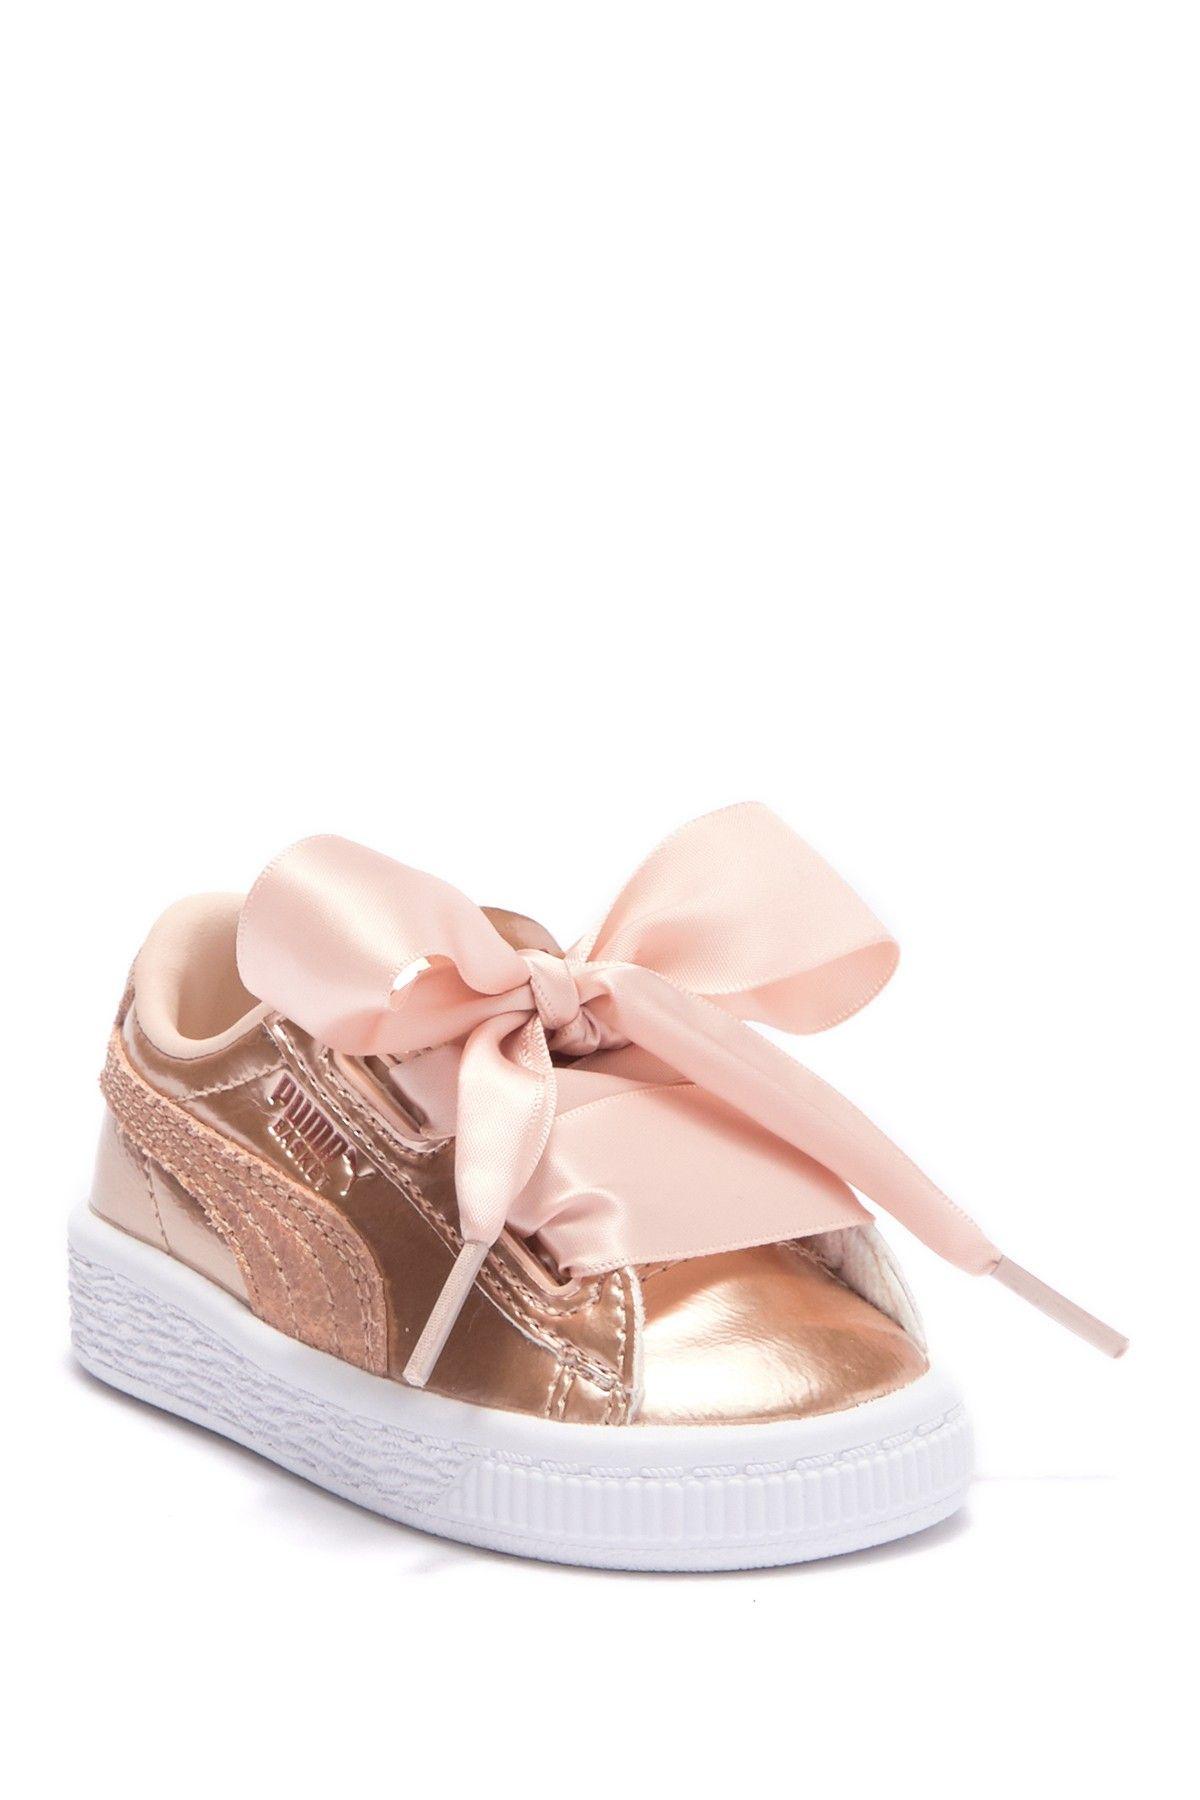 pretty nice 71a01 b5df5 Basket Heart Lunar Lux Sneaker (Toddler) | Products | Puma ...